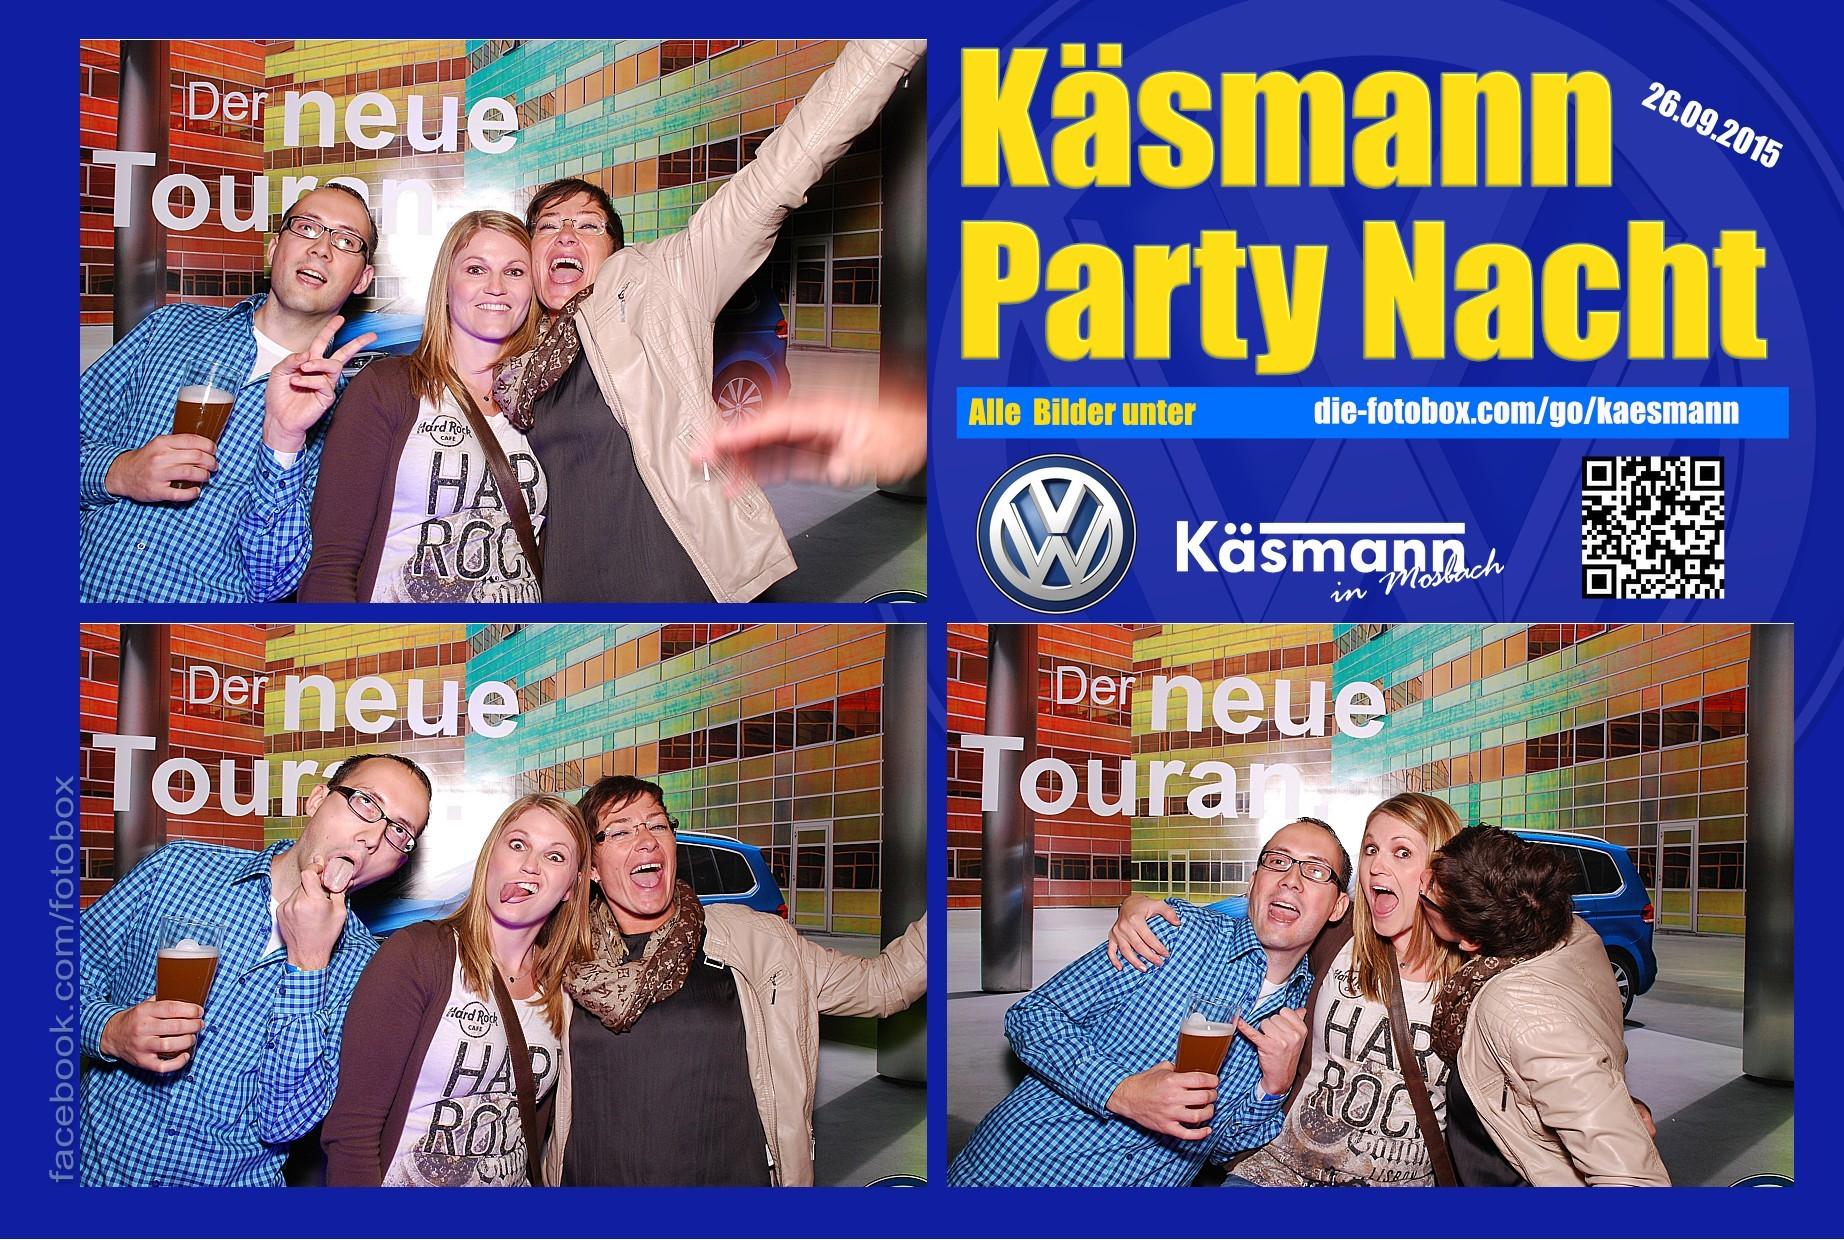 Käsmannparty 2015 - www.die-fotobox.com 01391